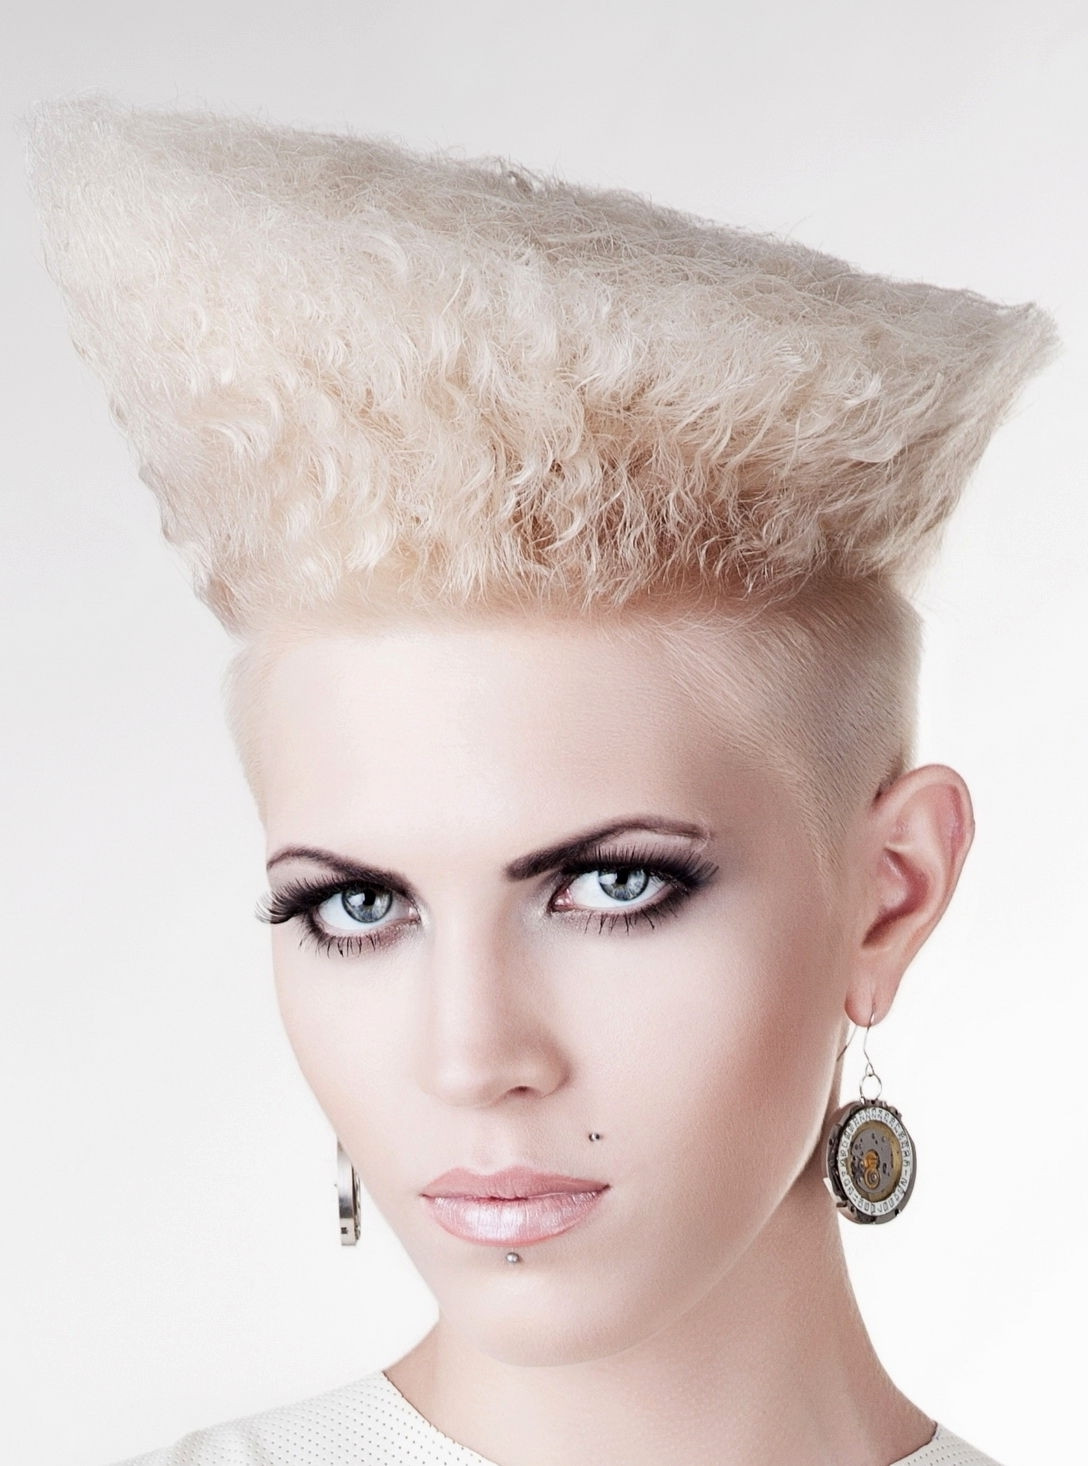 Female Undercut Hairstyles  Undercut Hairstyle Women